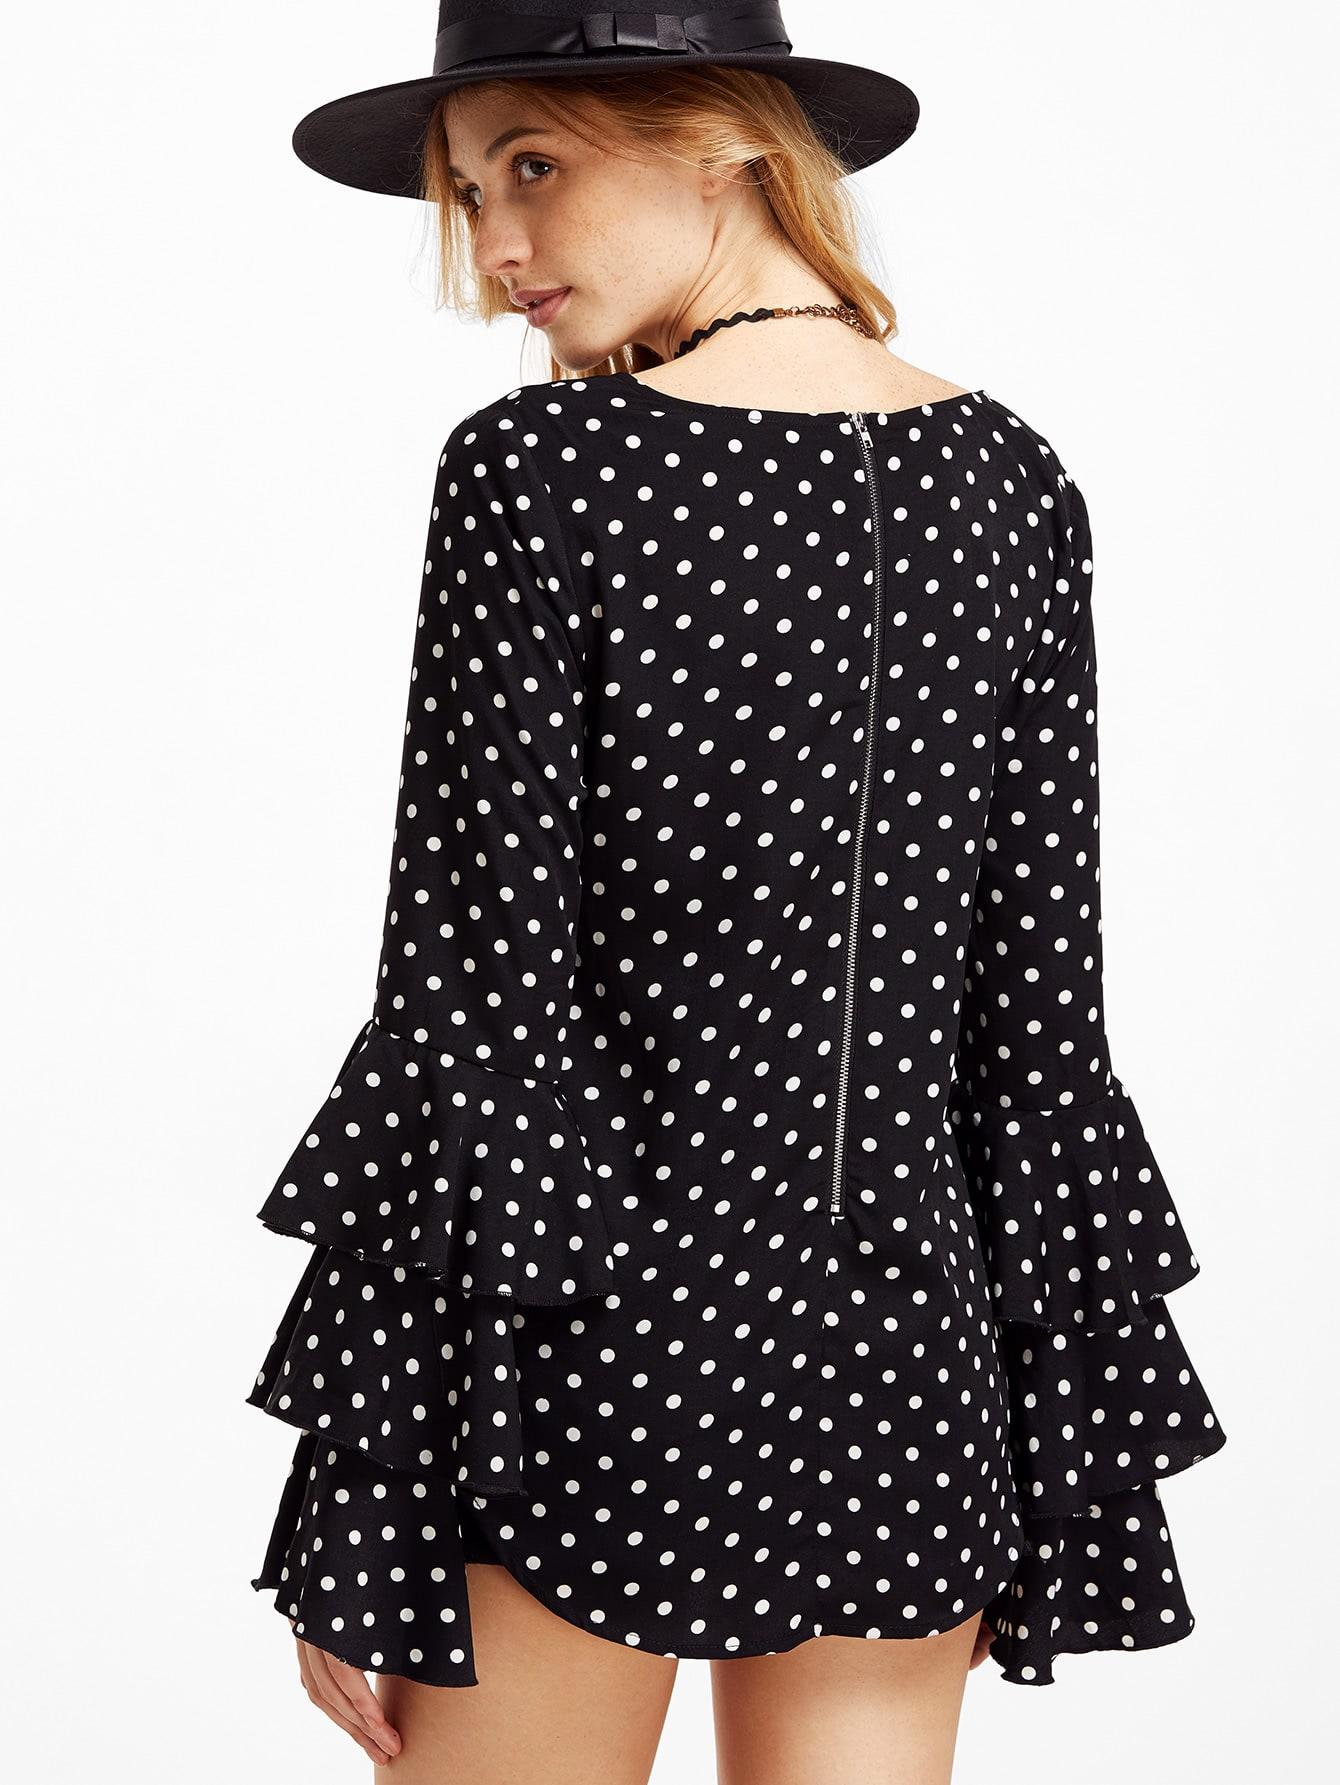 blouse160930703_2